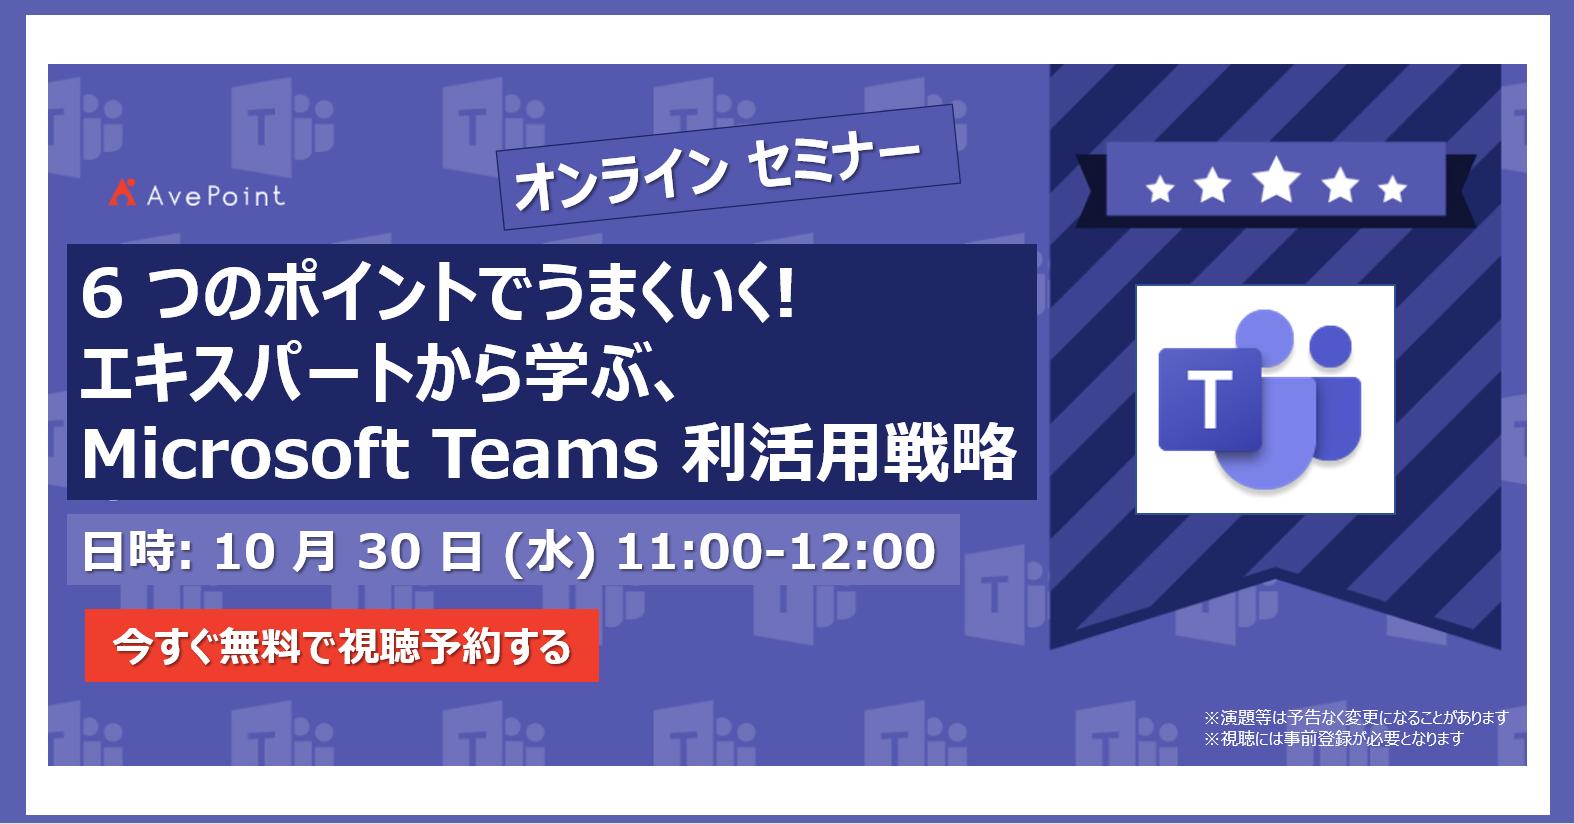 Microsoft Teams 利活用オンラインセミナー